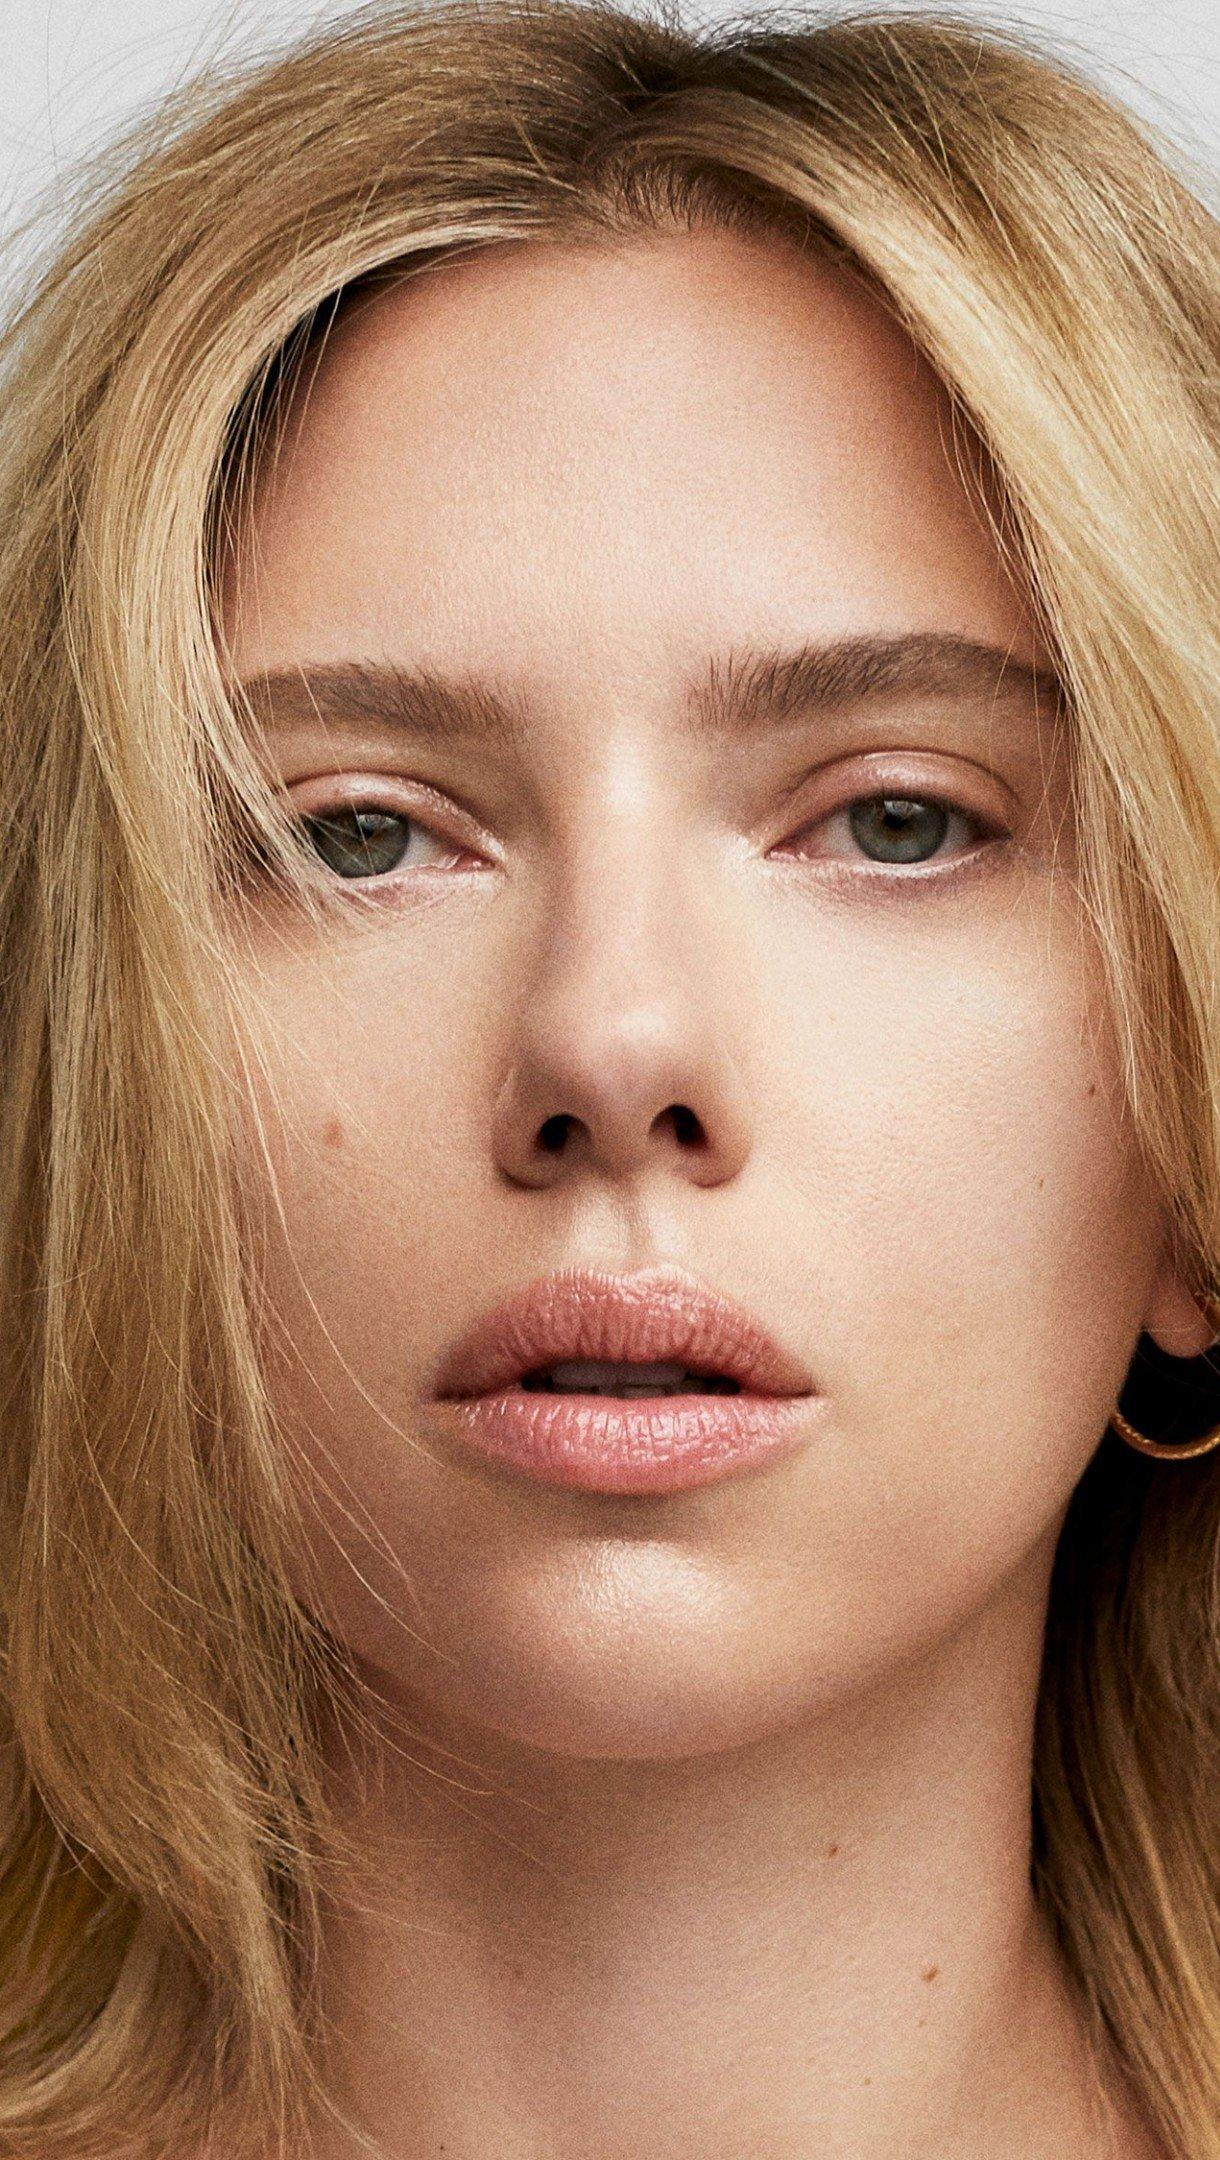 Wallpaper Scarlett Johansson with no make up Vertical